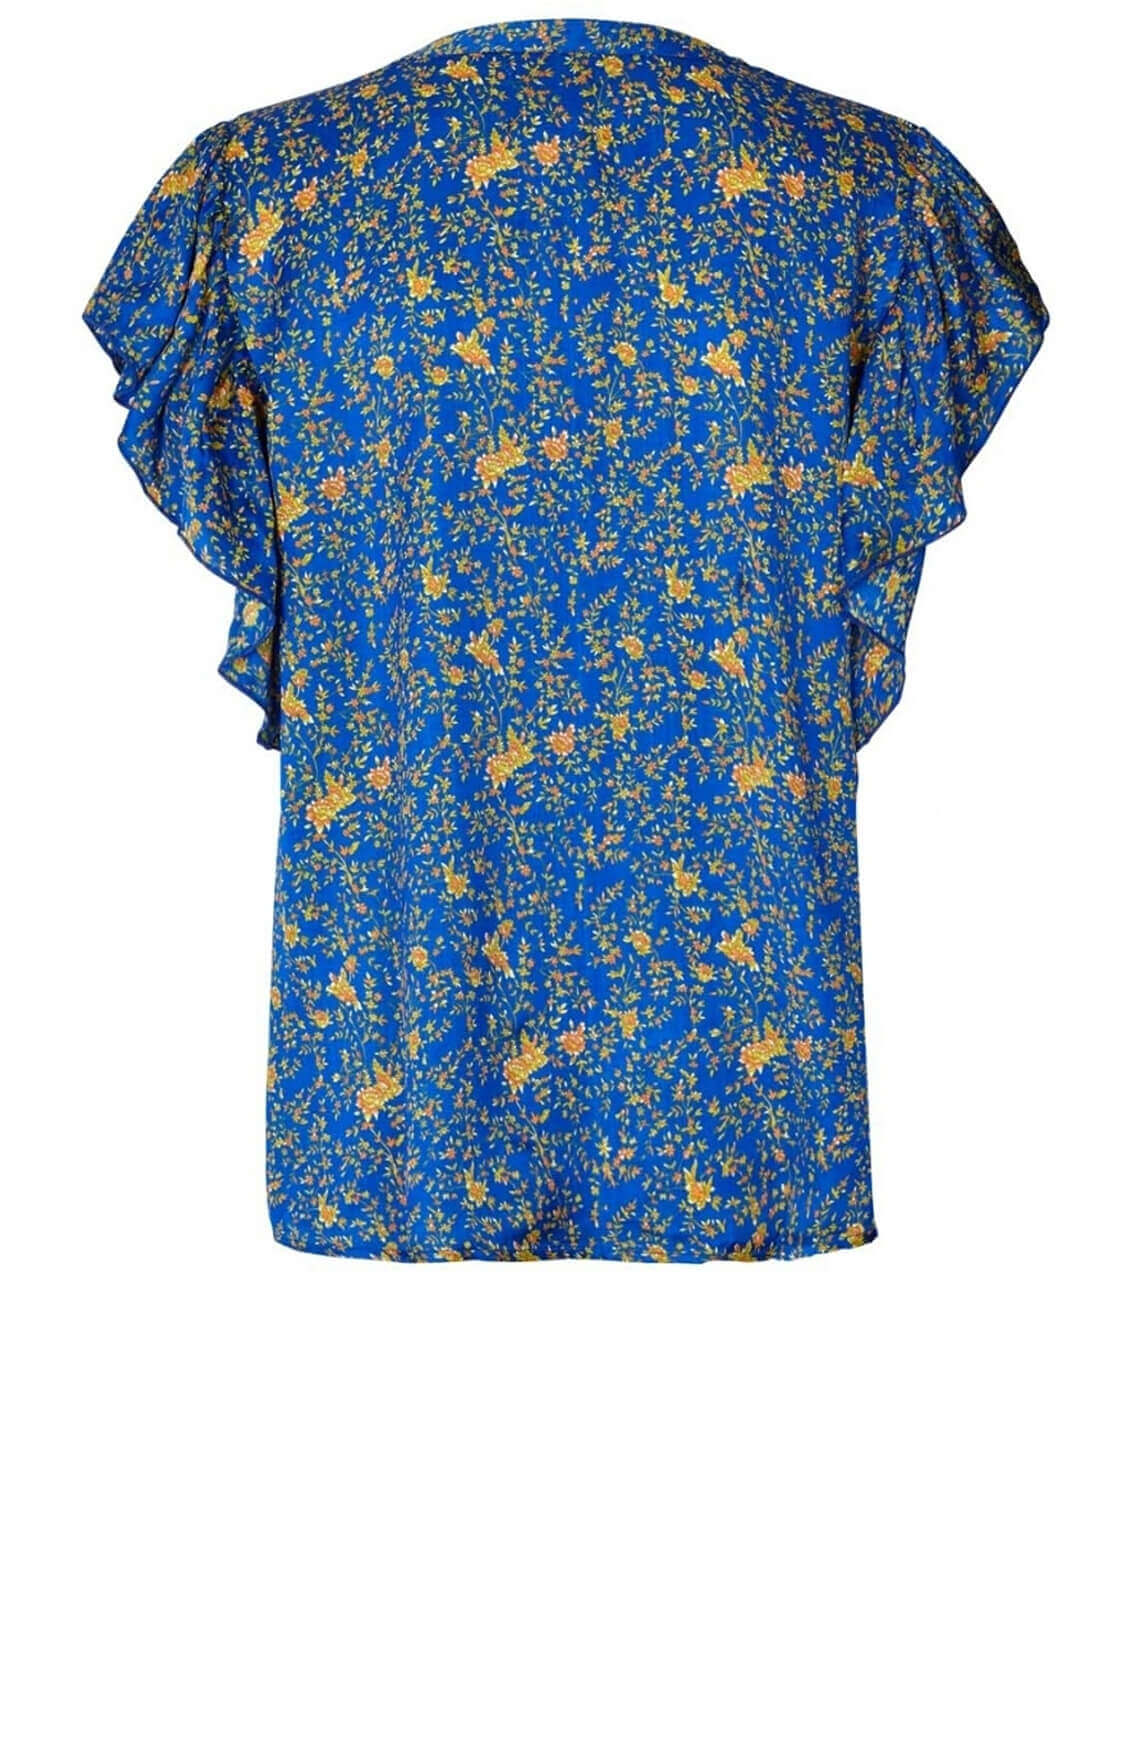 Lollys Laundry Dames Isabel blouse Blauw